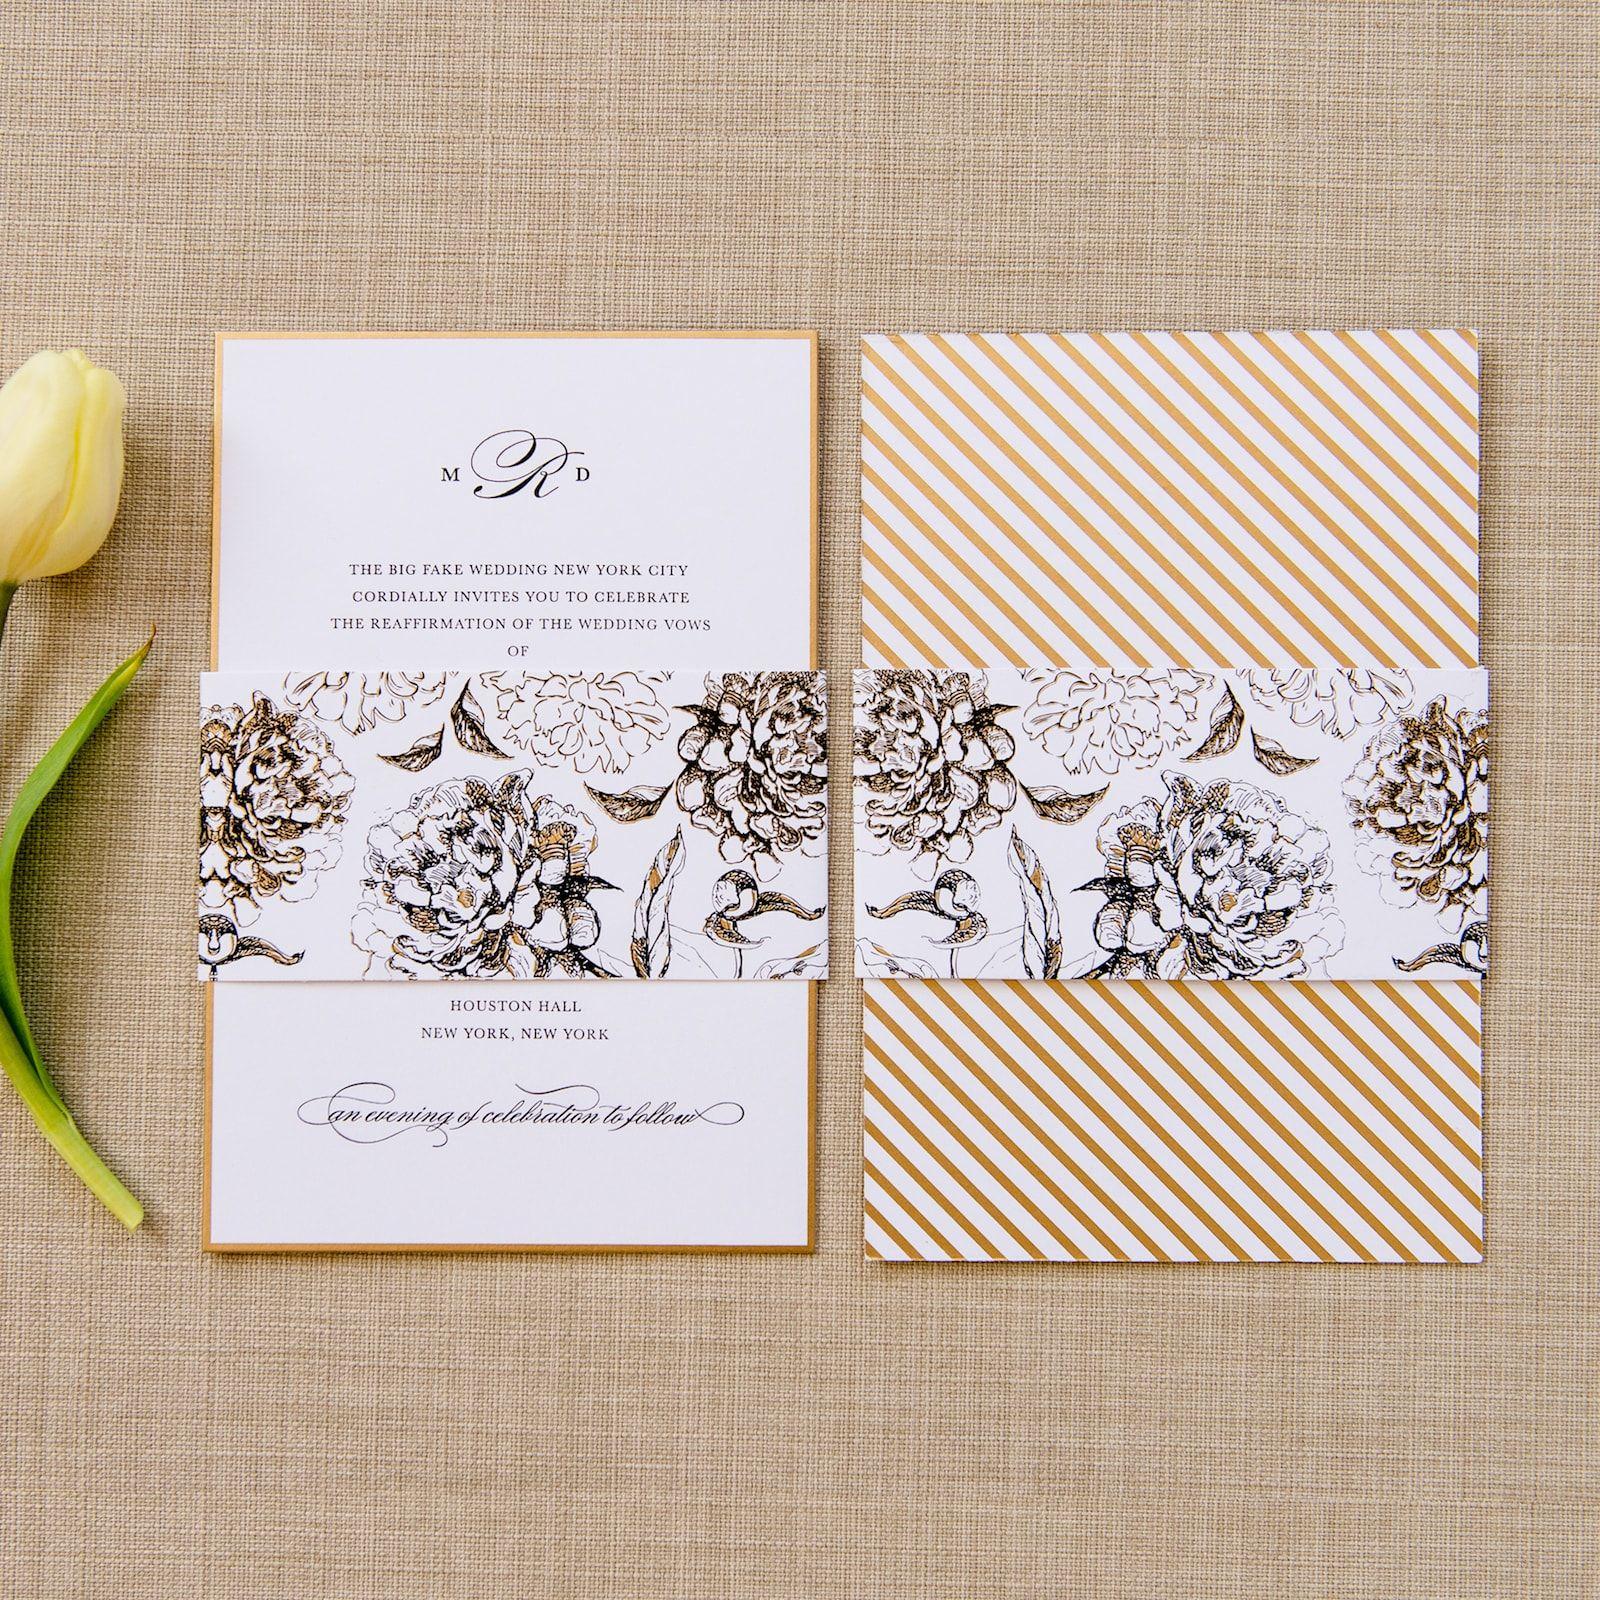 Meg wedding invitation 招待状